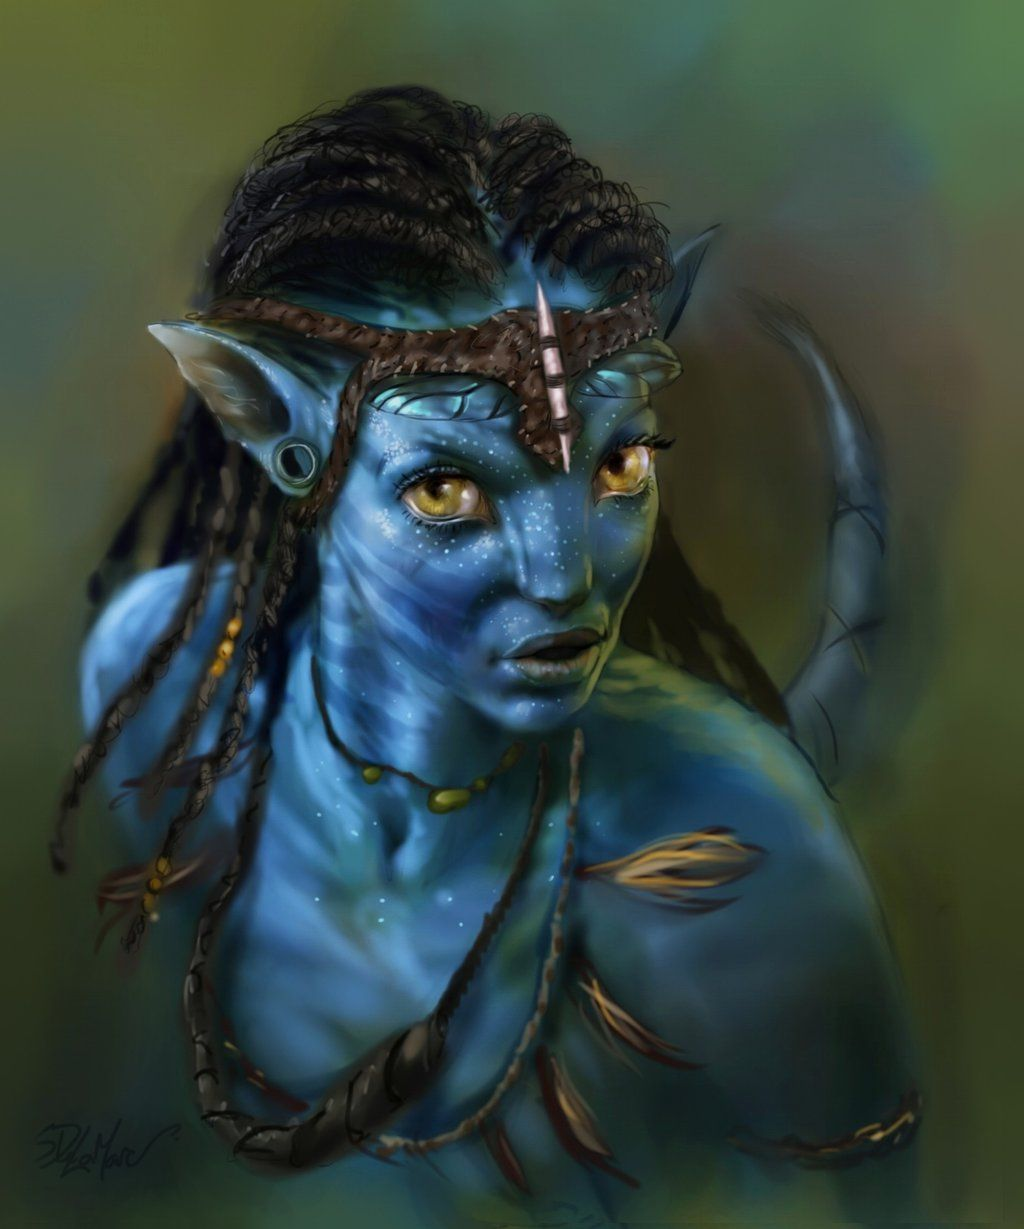 Avatar Movie Characters: Neytiri Na'vi By SteveDelamare On DeviantArt